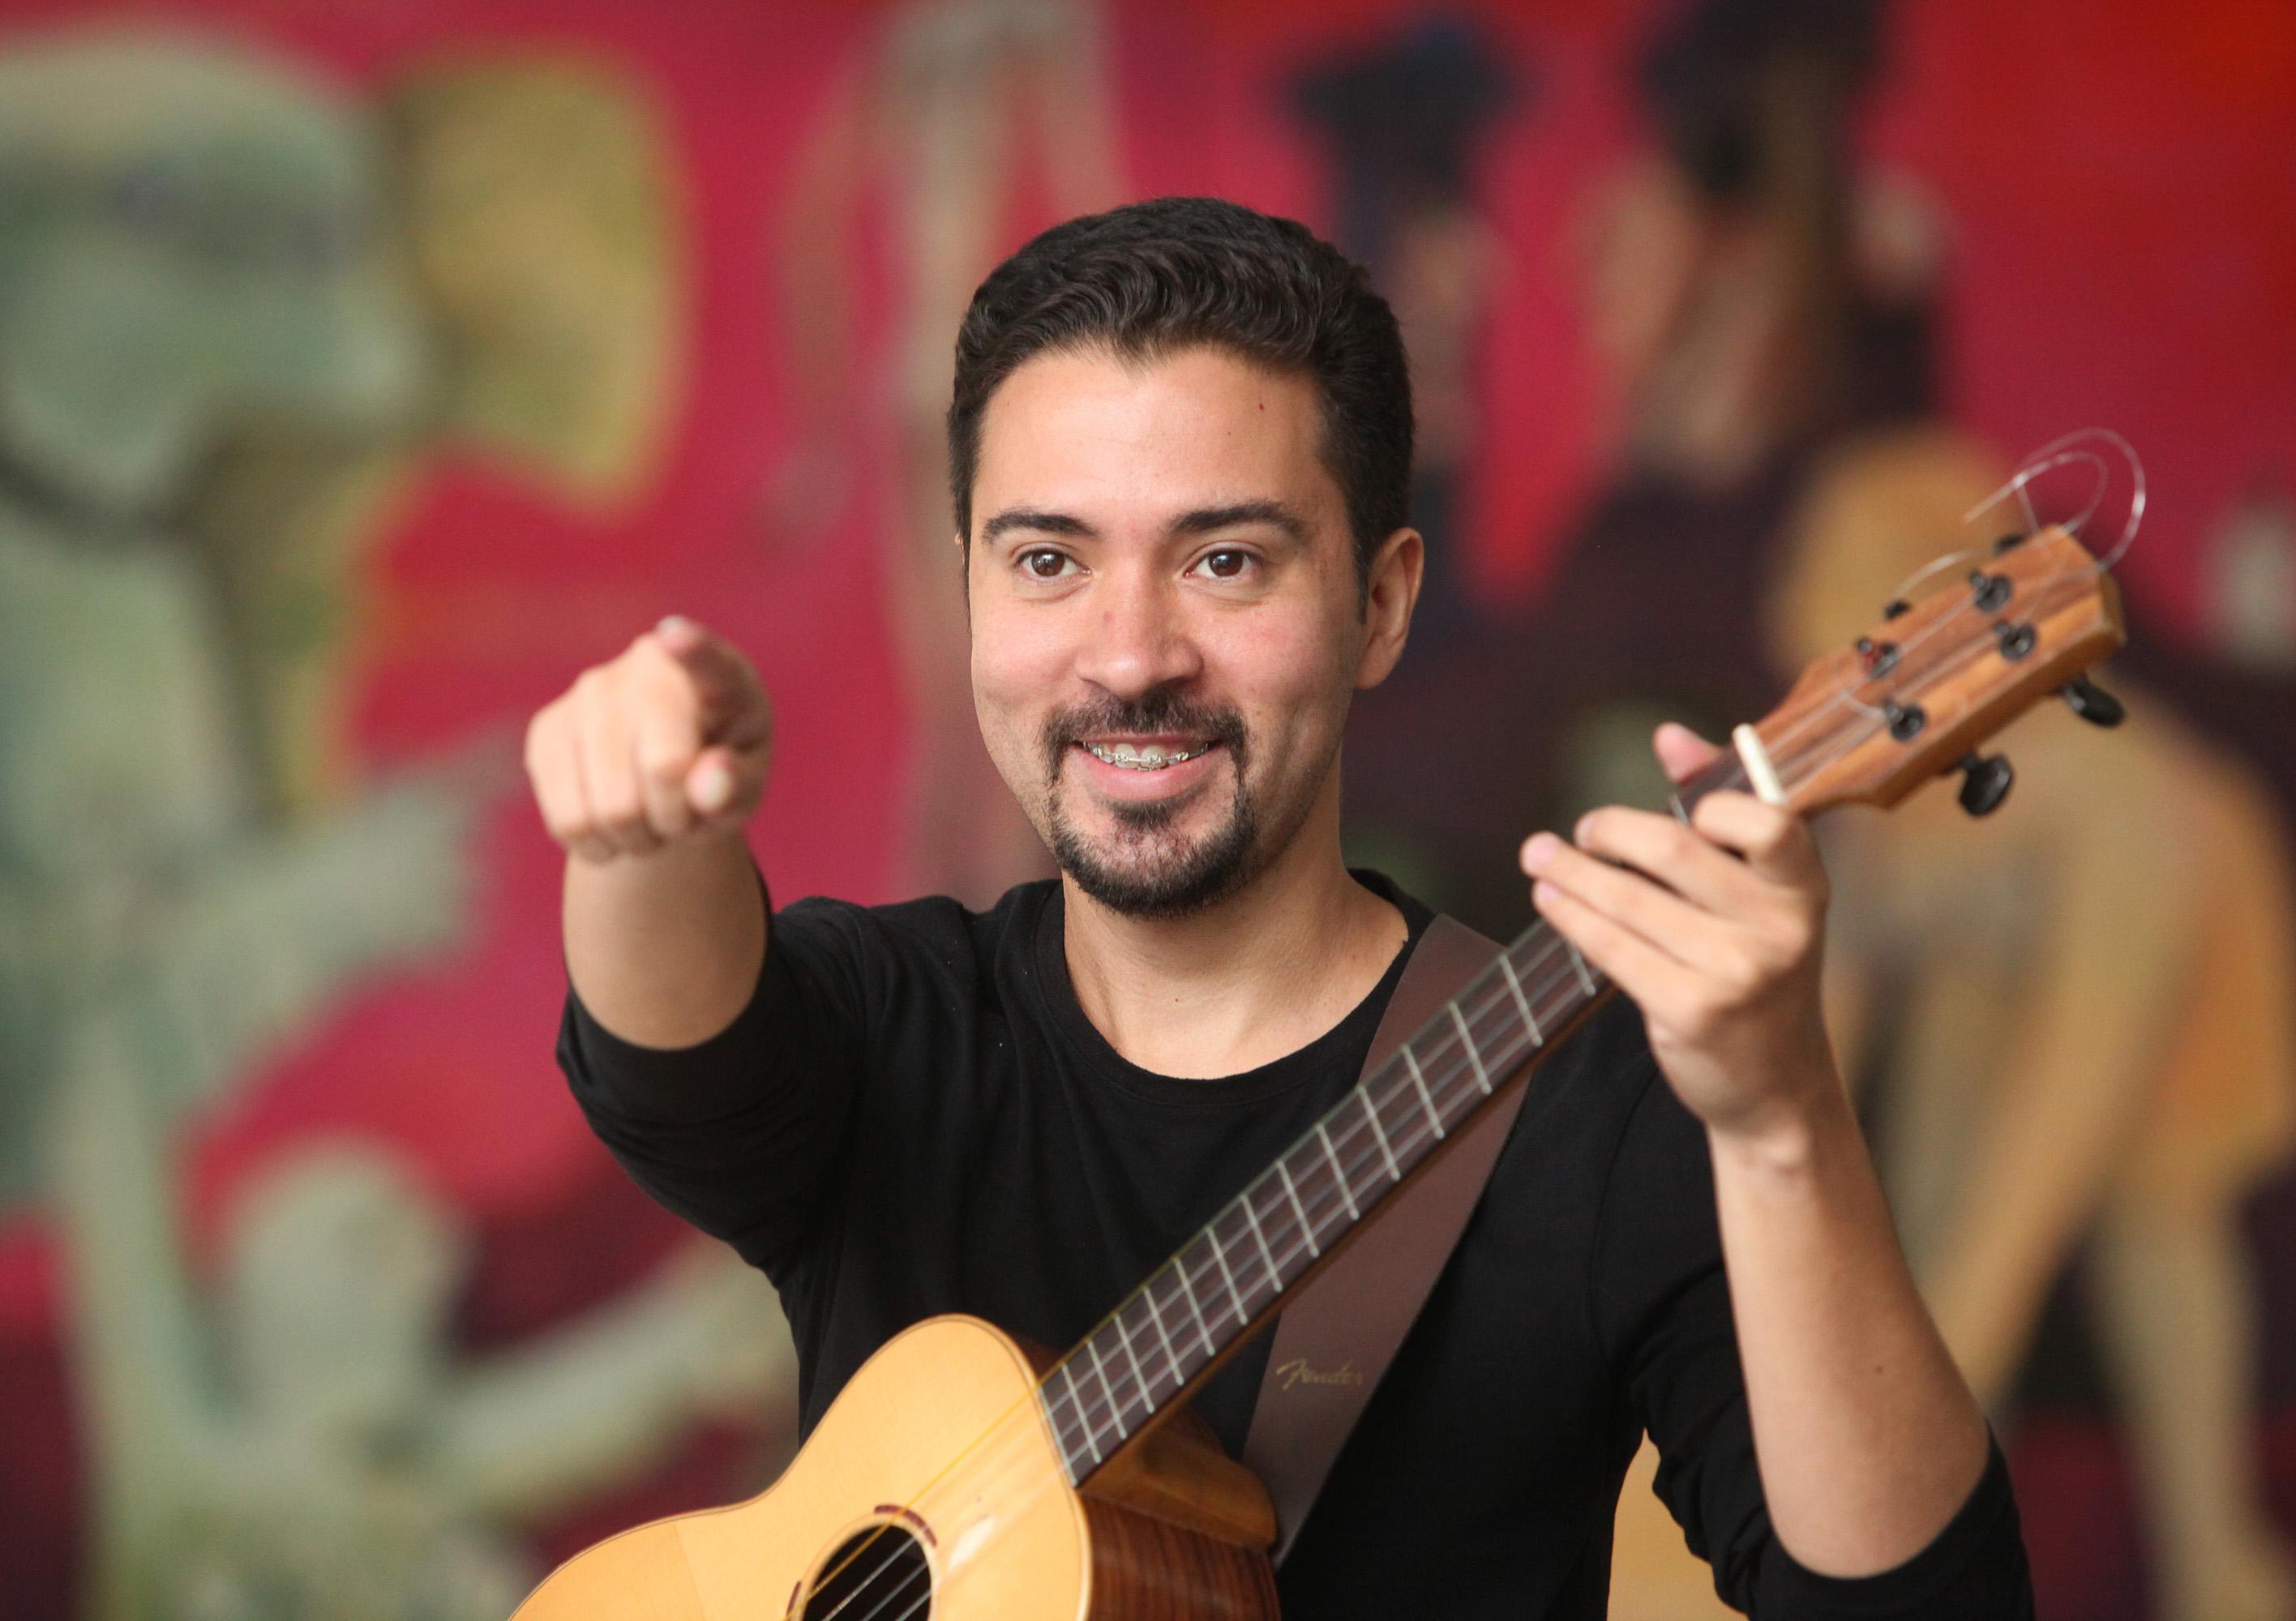 Edward Ramírez Músico. Caracas,21-05-2014 (MANUEL SARDA / EL NACIONAL)